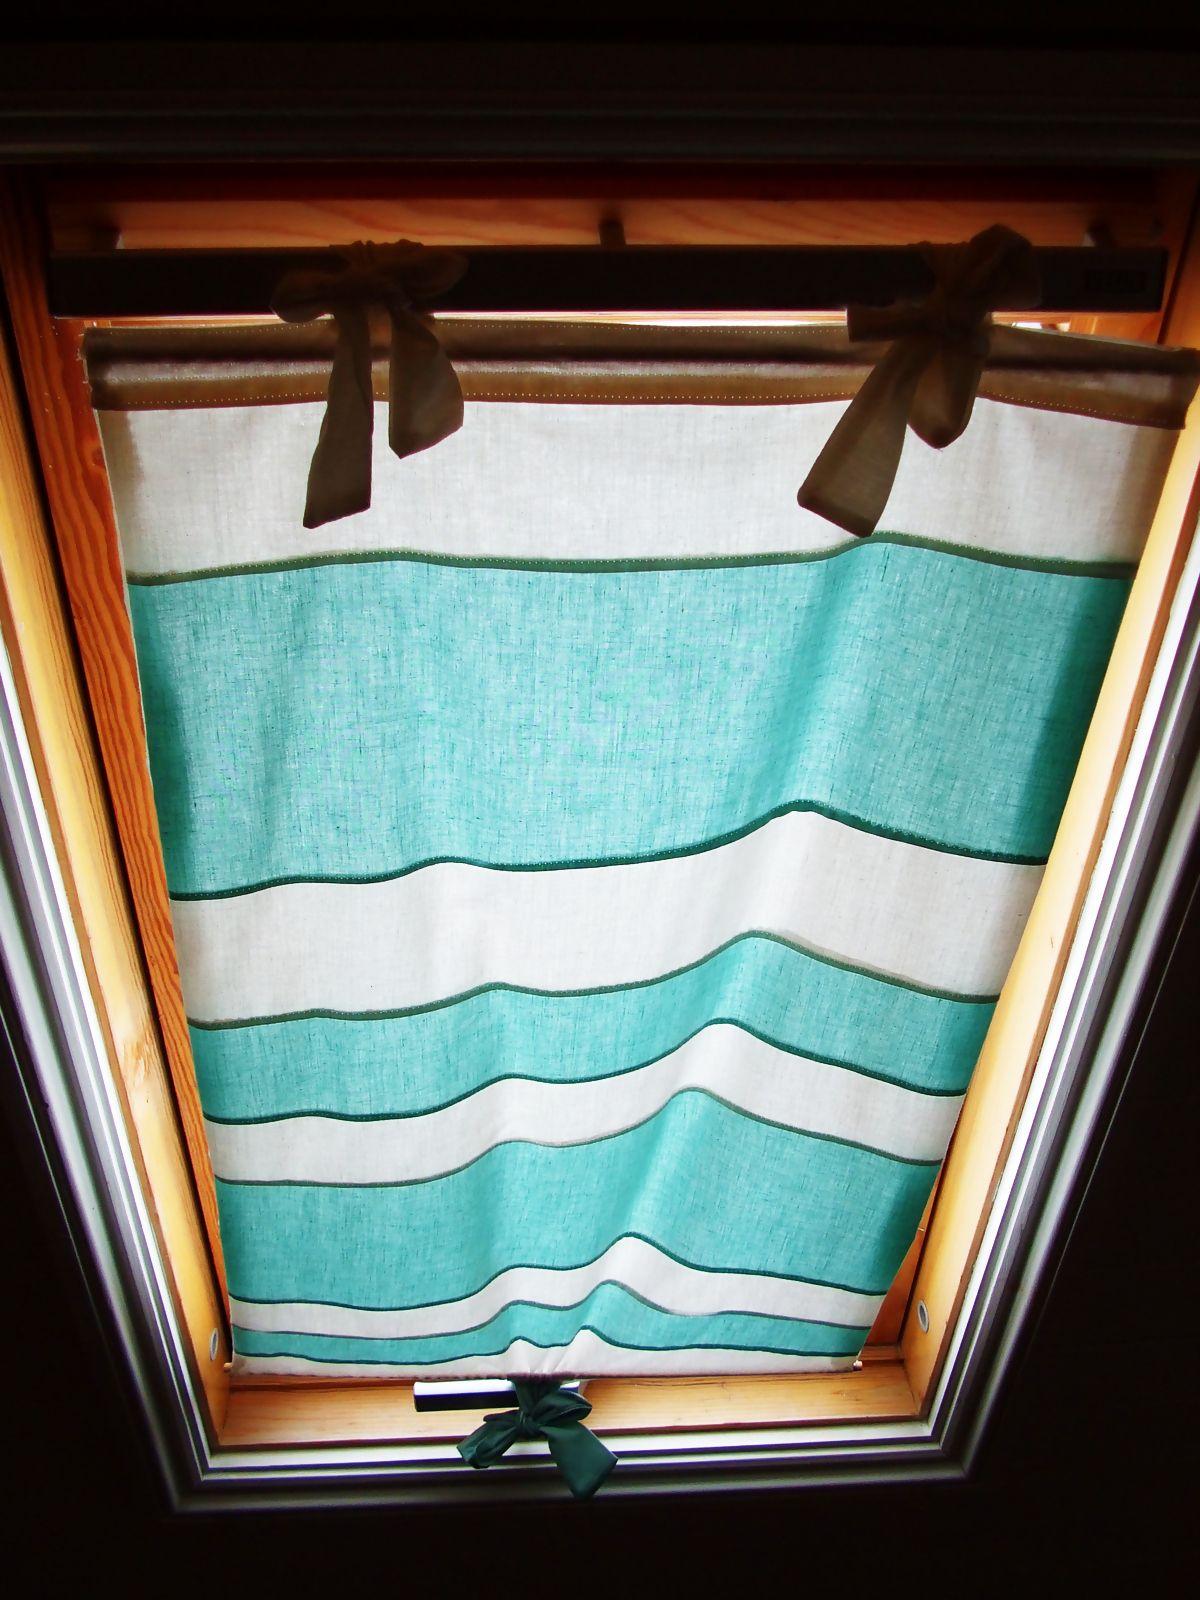 Skylight blind create crafts pinterest cortinas - Cortinas para tragaluz ...